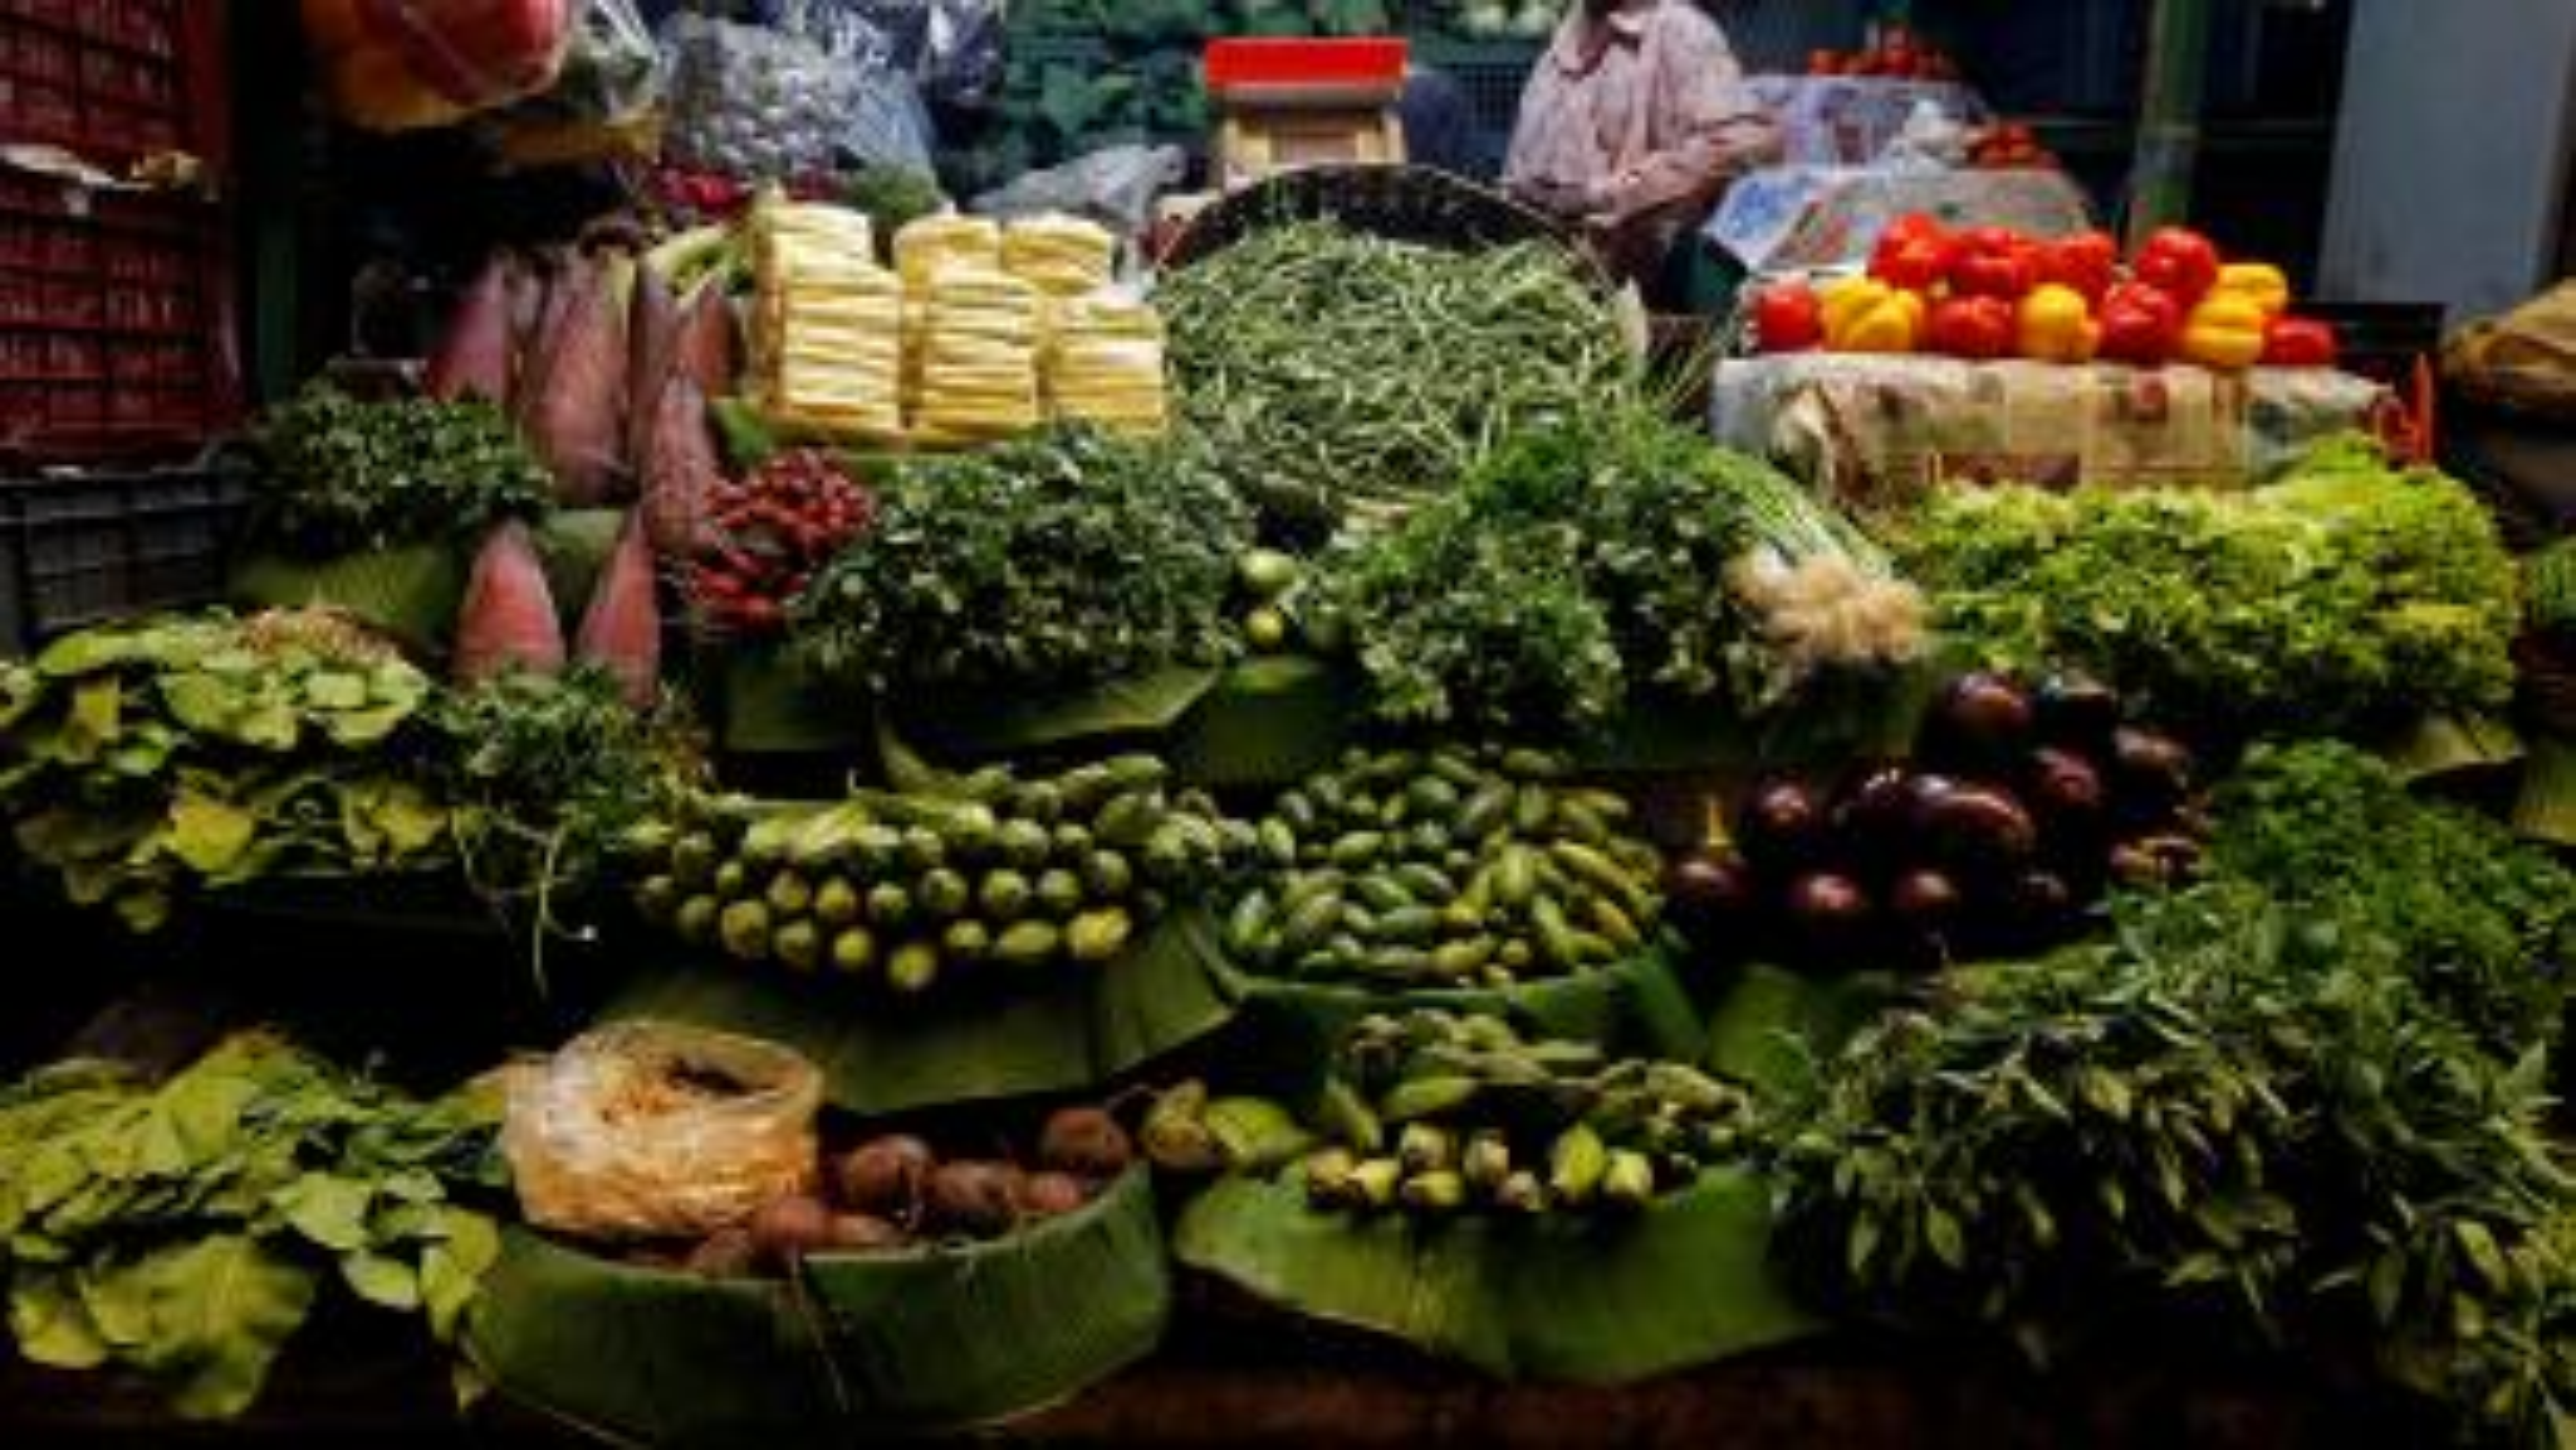 Vegetables on display at a market.